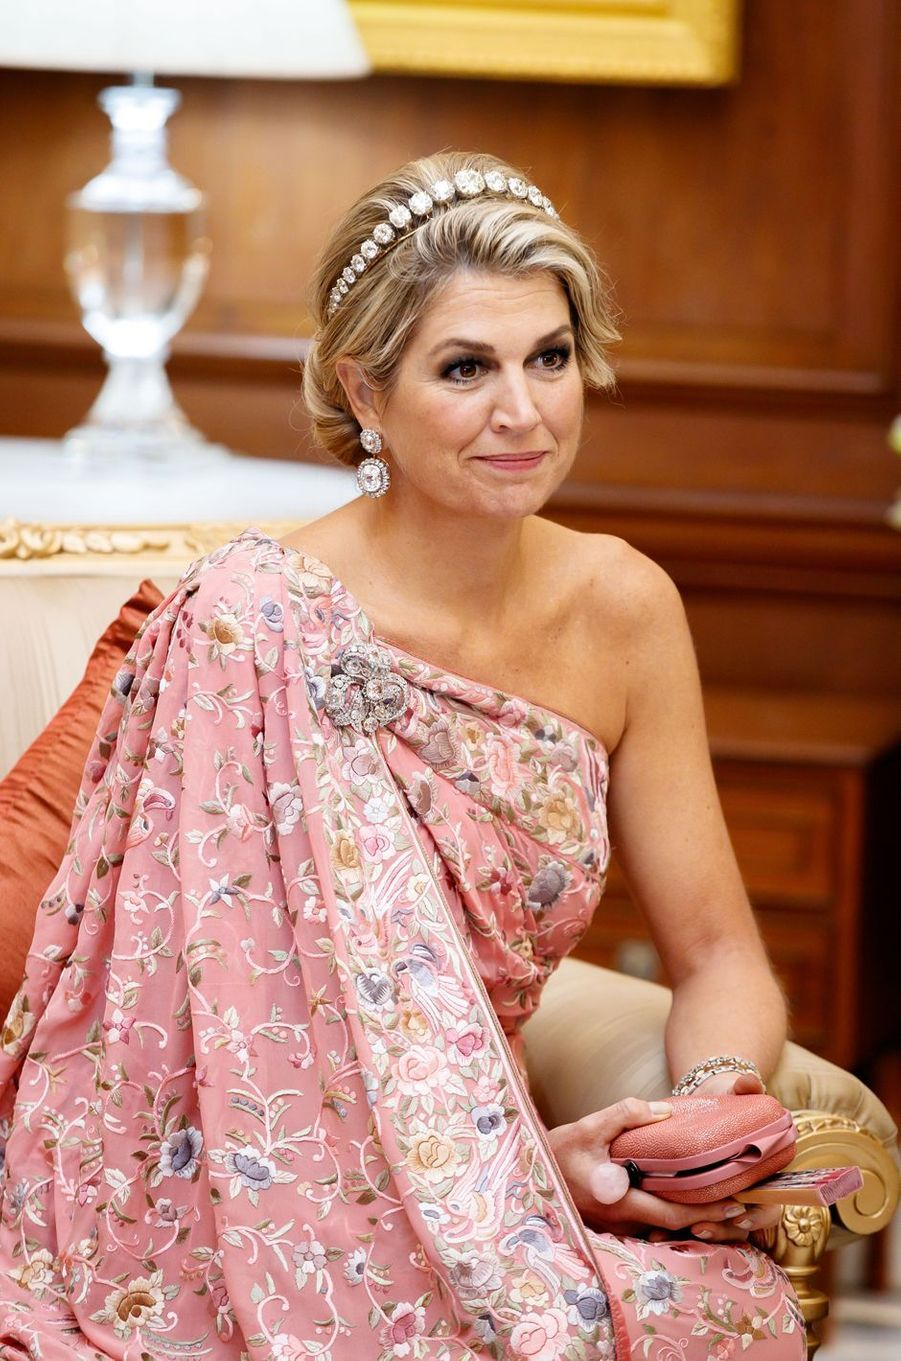 La reine Maxima des Pays-Bas à New Delhi, le 14 octobre 2019